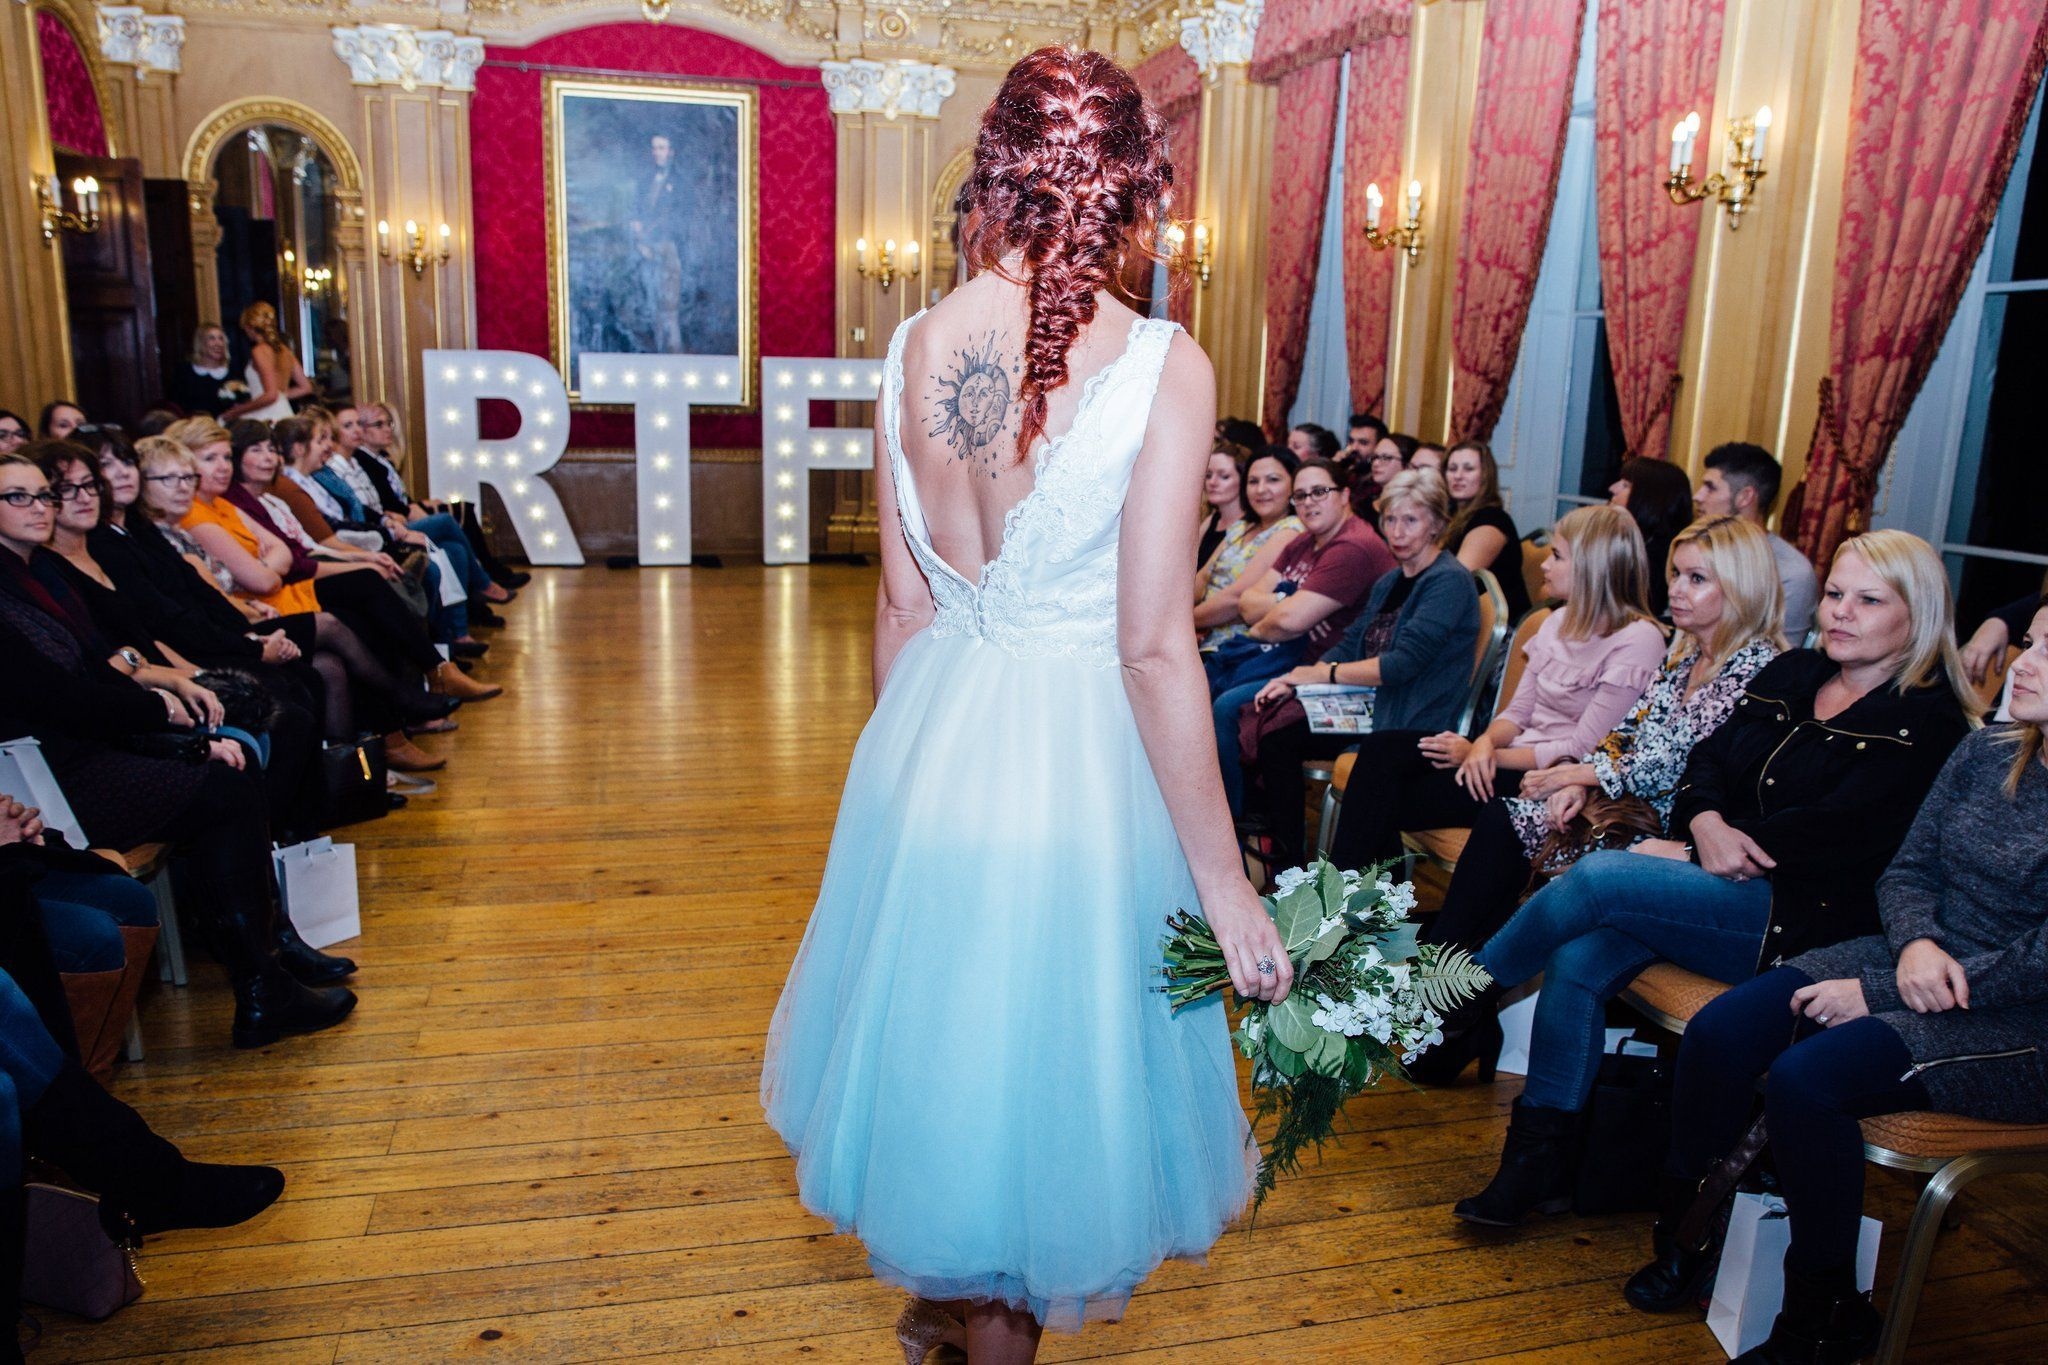 Dye wedding dress after wedding  Hound Dogu by Lucy Canut Dance Blue dip dye wedding dress with lace